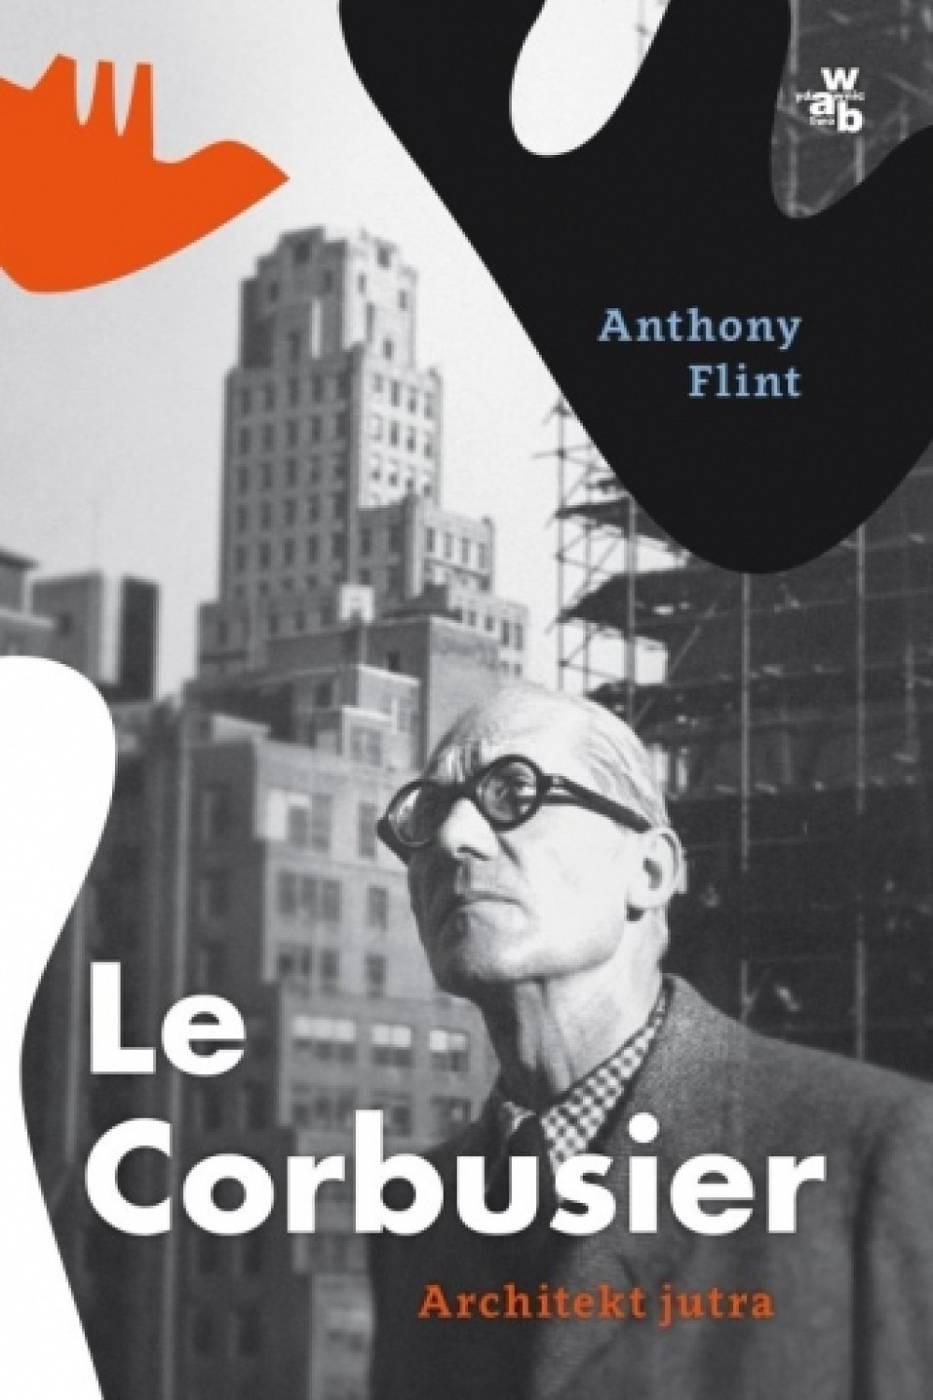 4. Le Corbusier. Architekt jutra, Anthony Flint